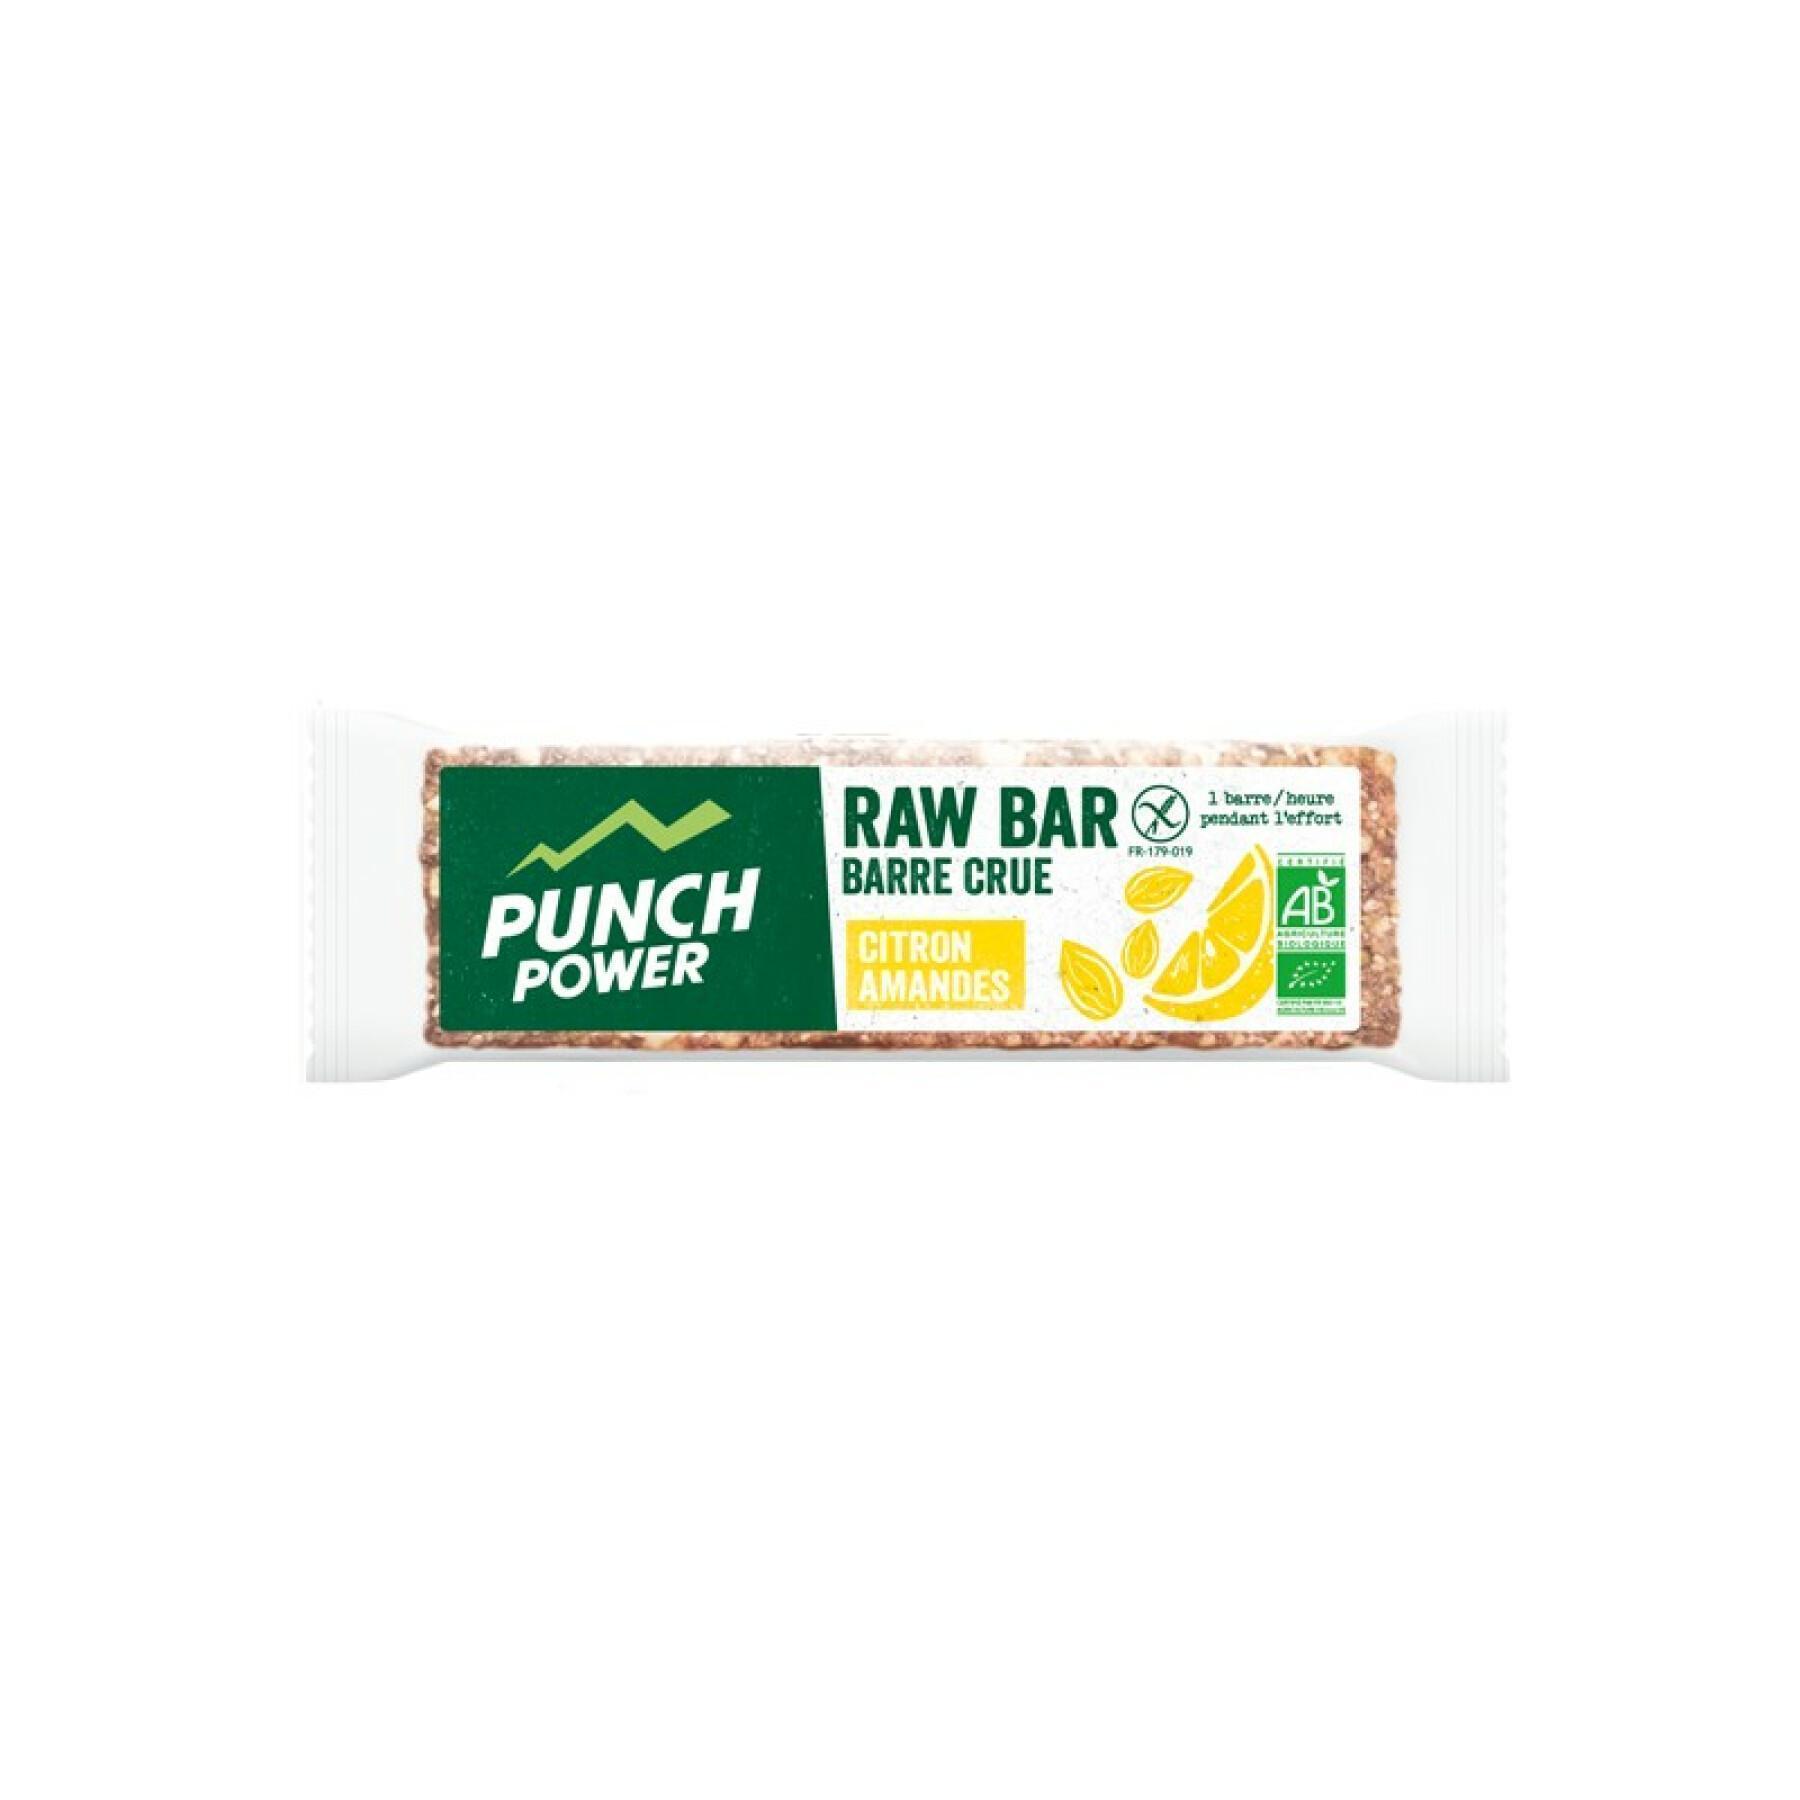 Display 20 energy bars Punch Power Rawbar Citron amande